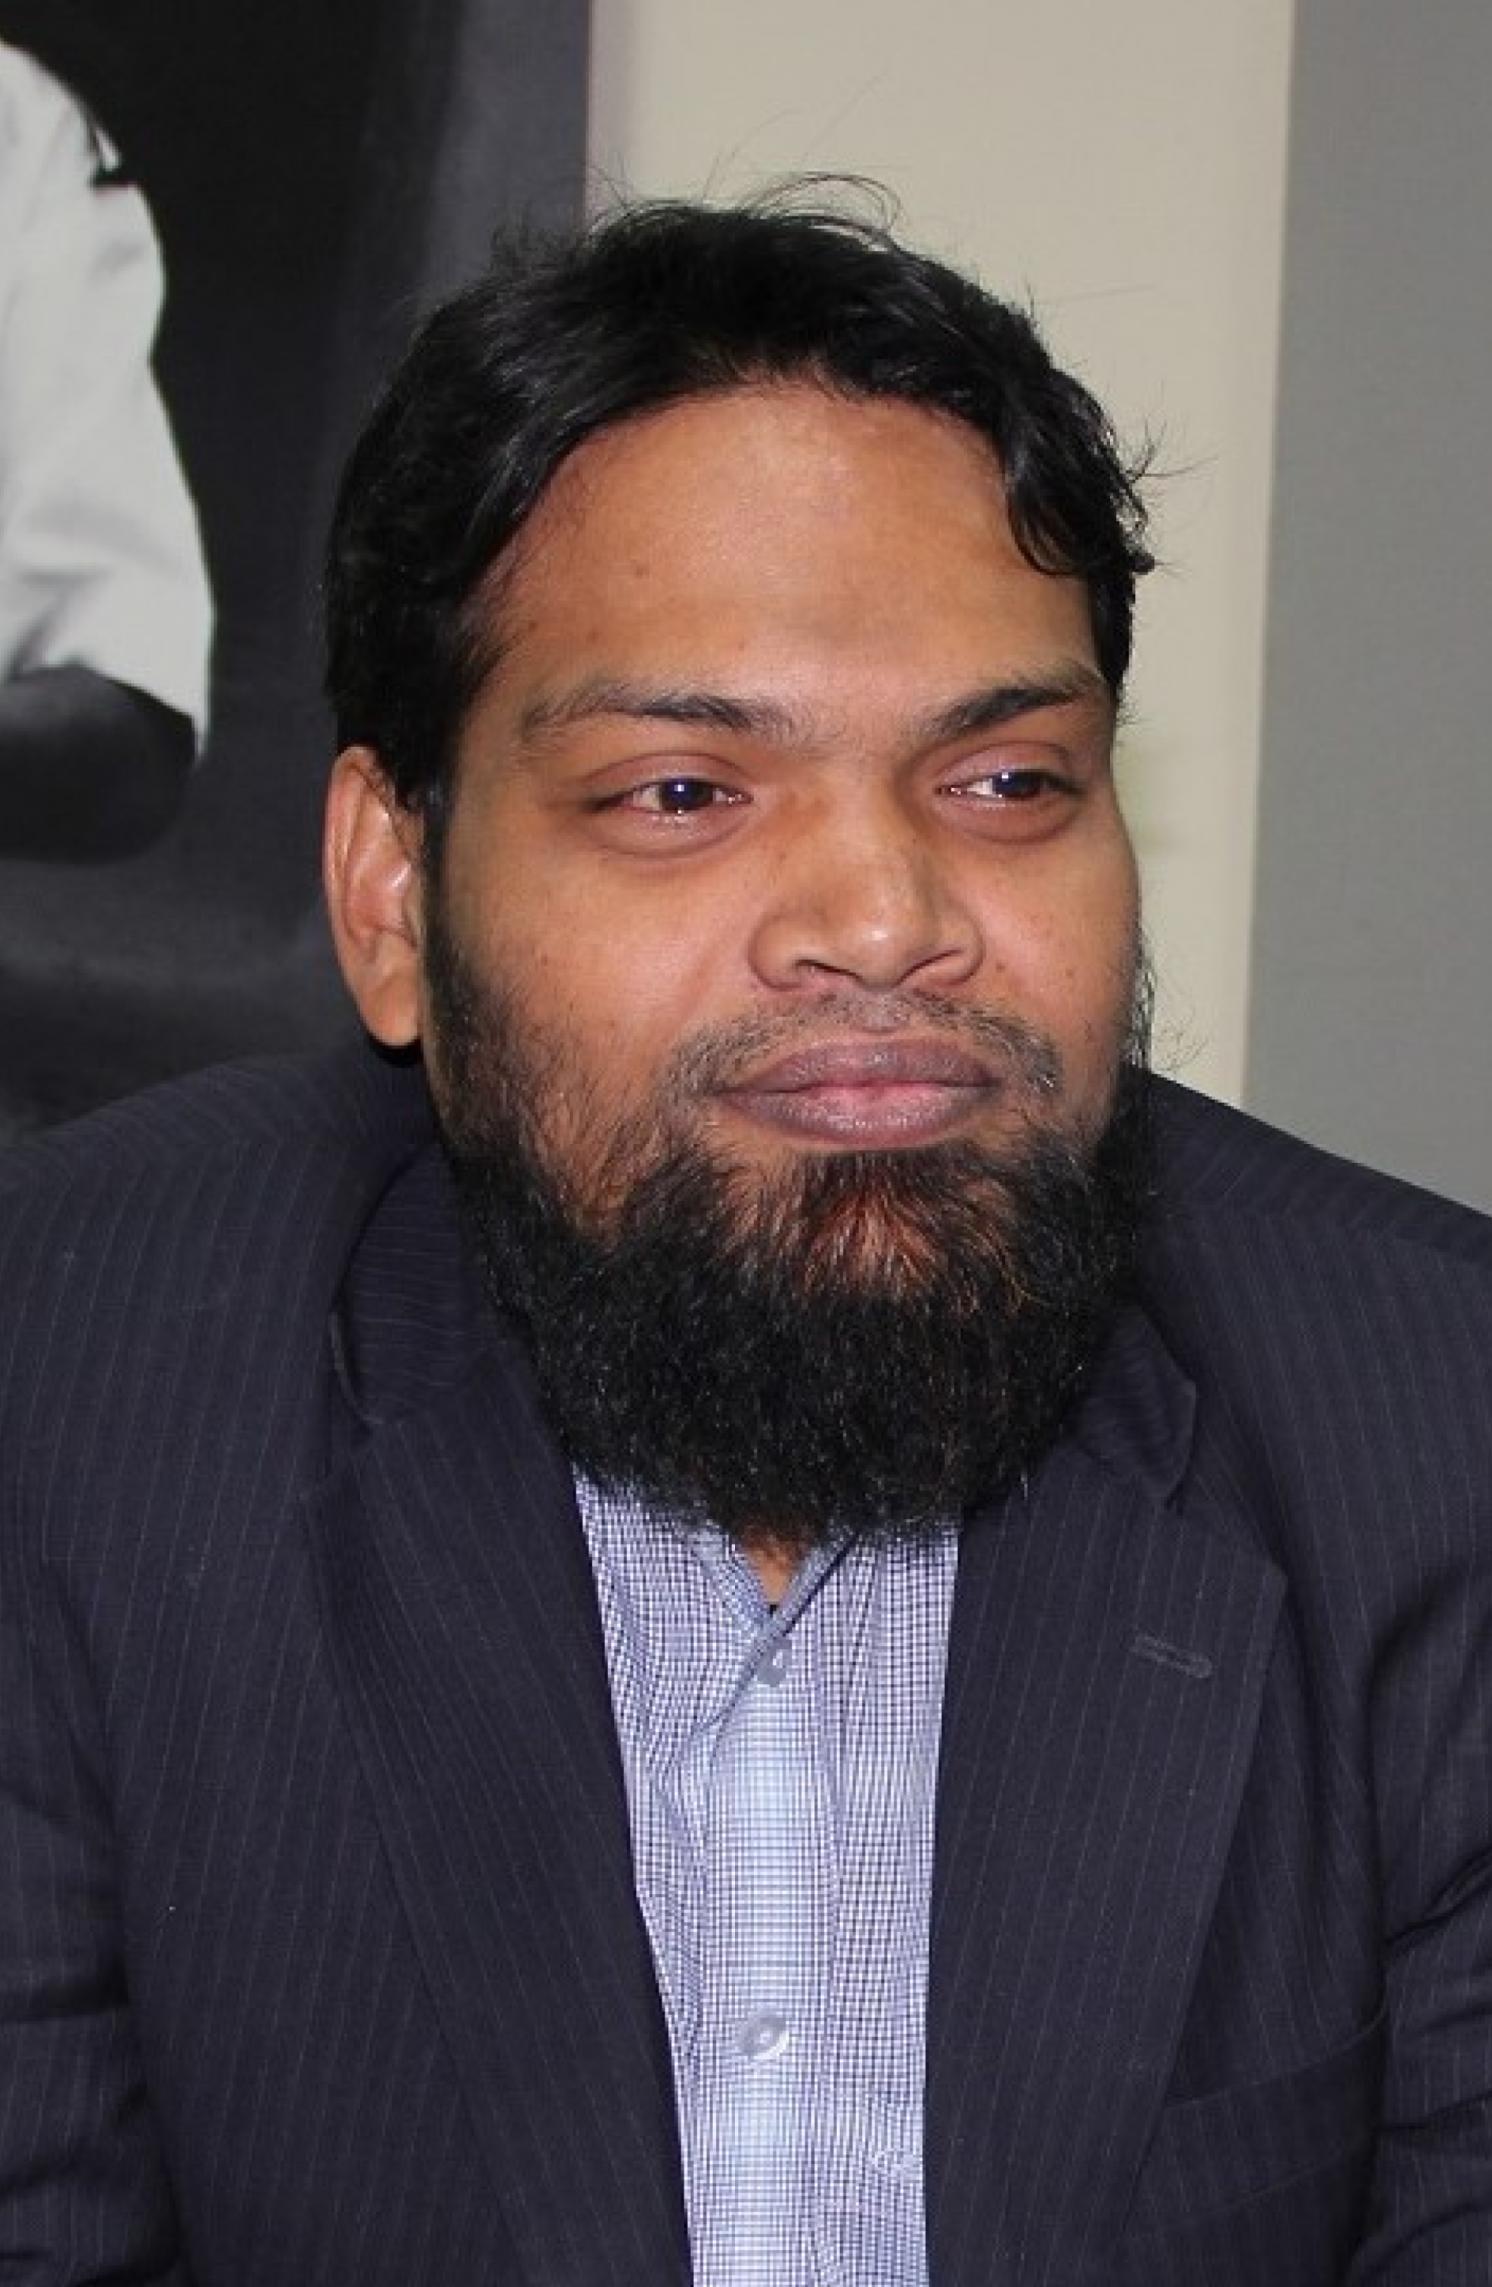 Munir Hussain | ムニル・フセイン